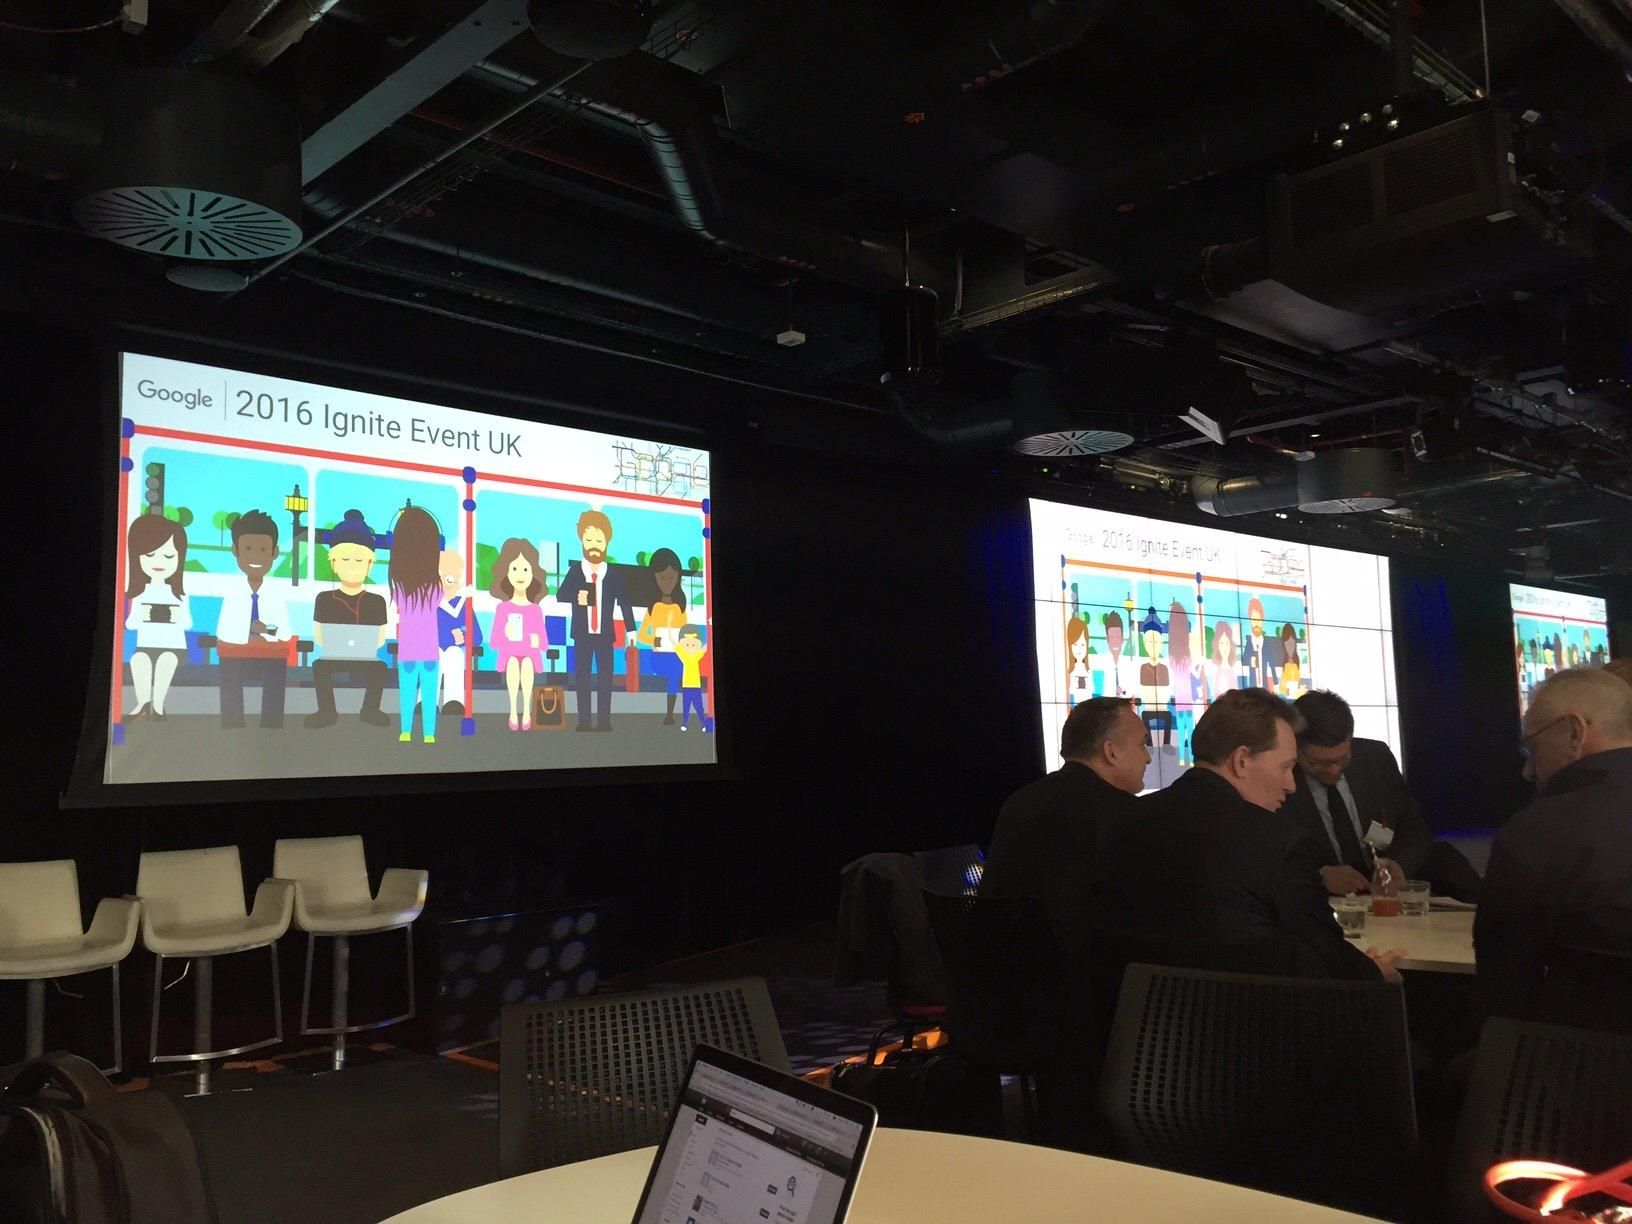 Google Ignite Event